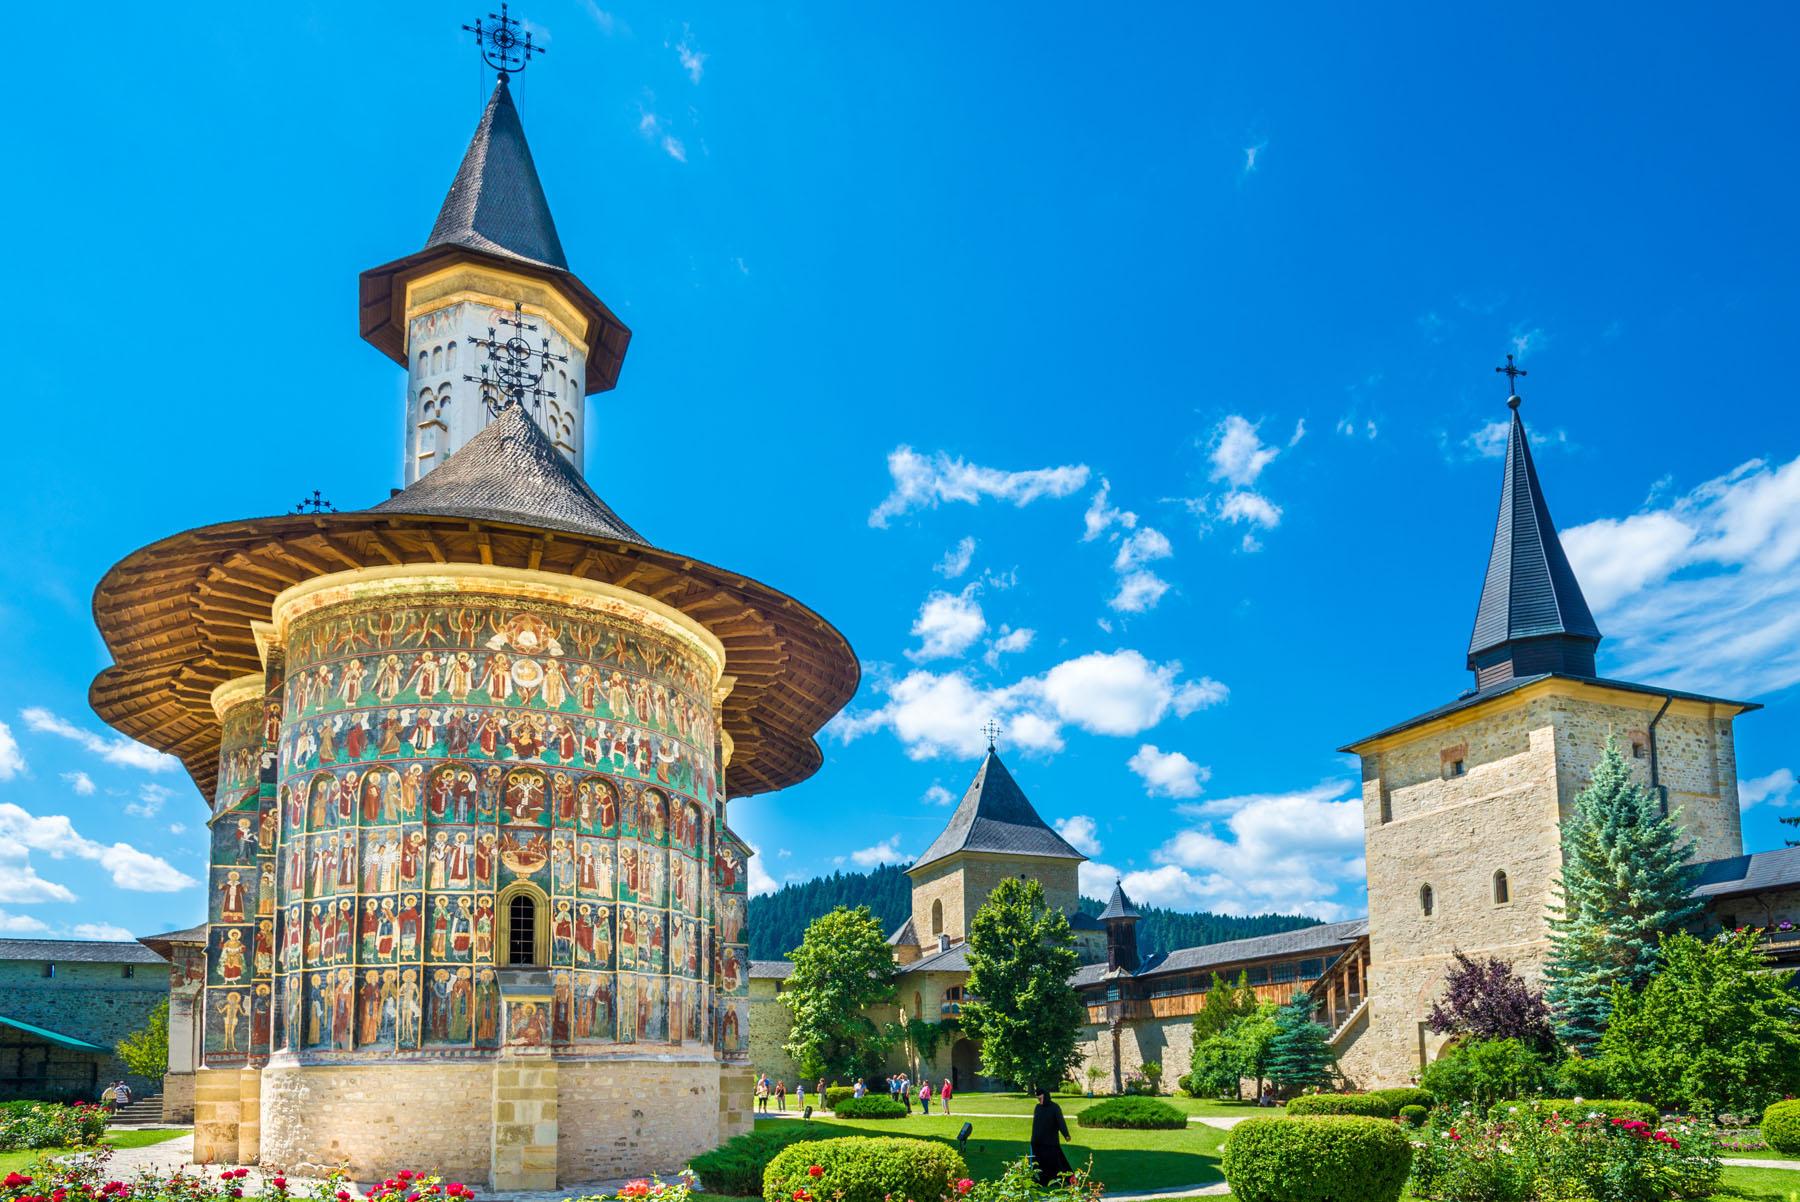 Romania-Sucevita-Bucovina_492191755